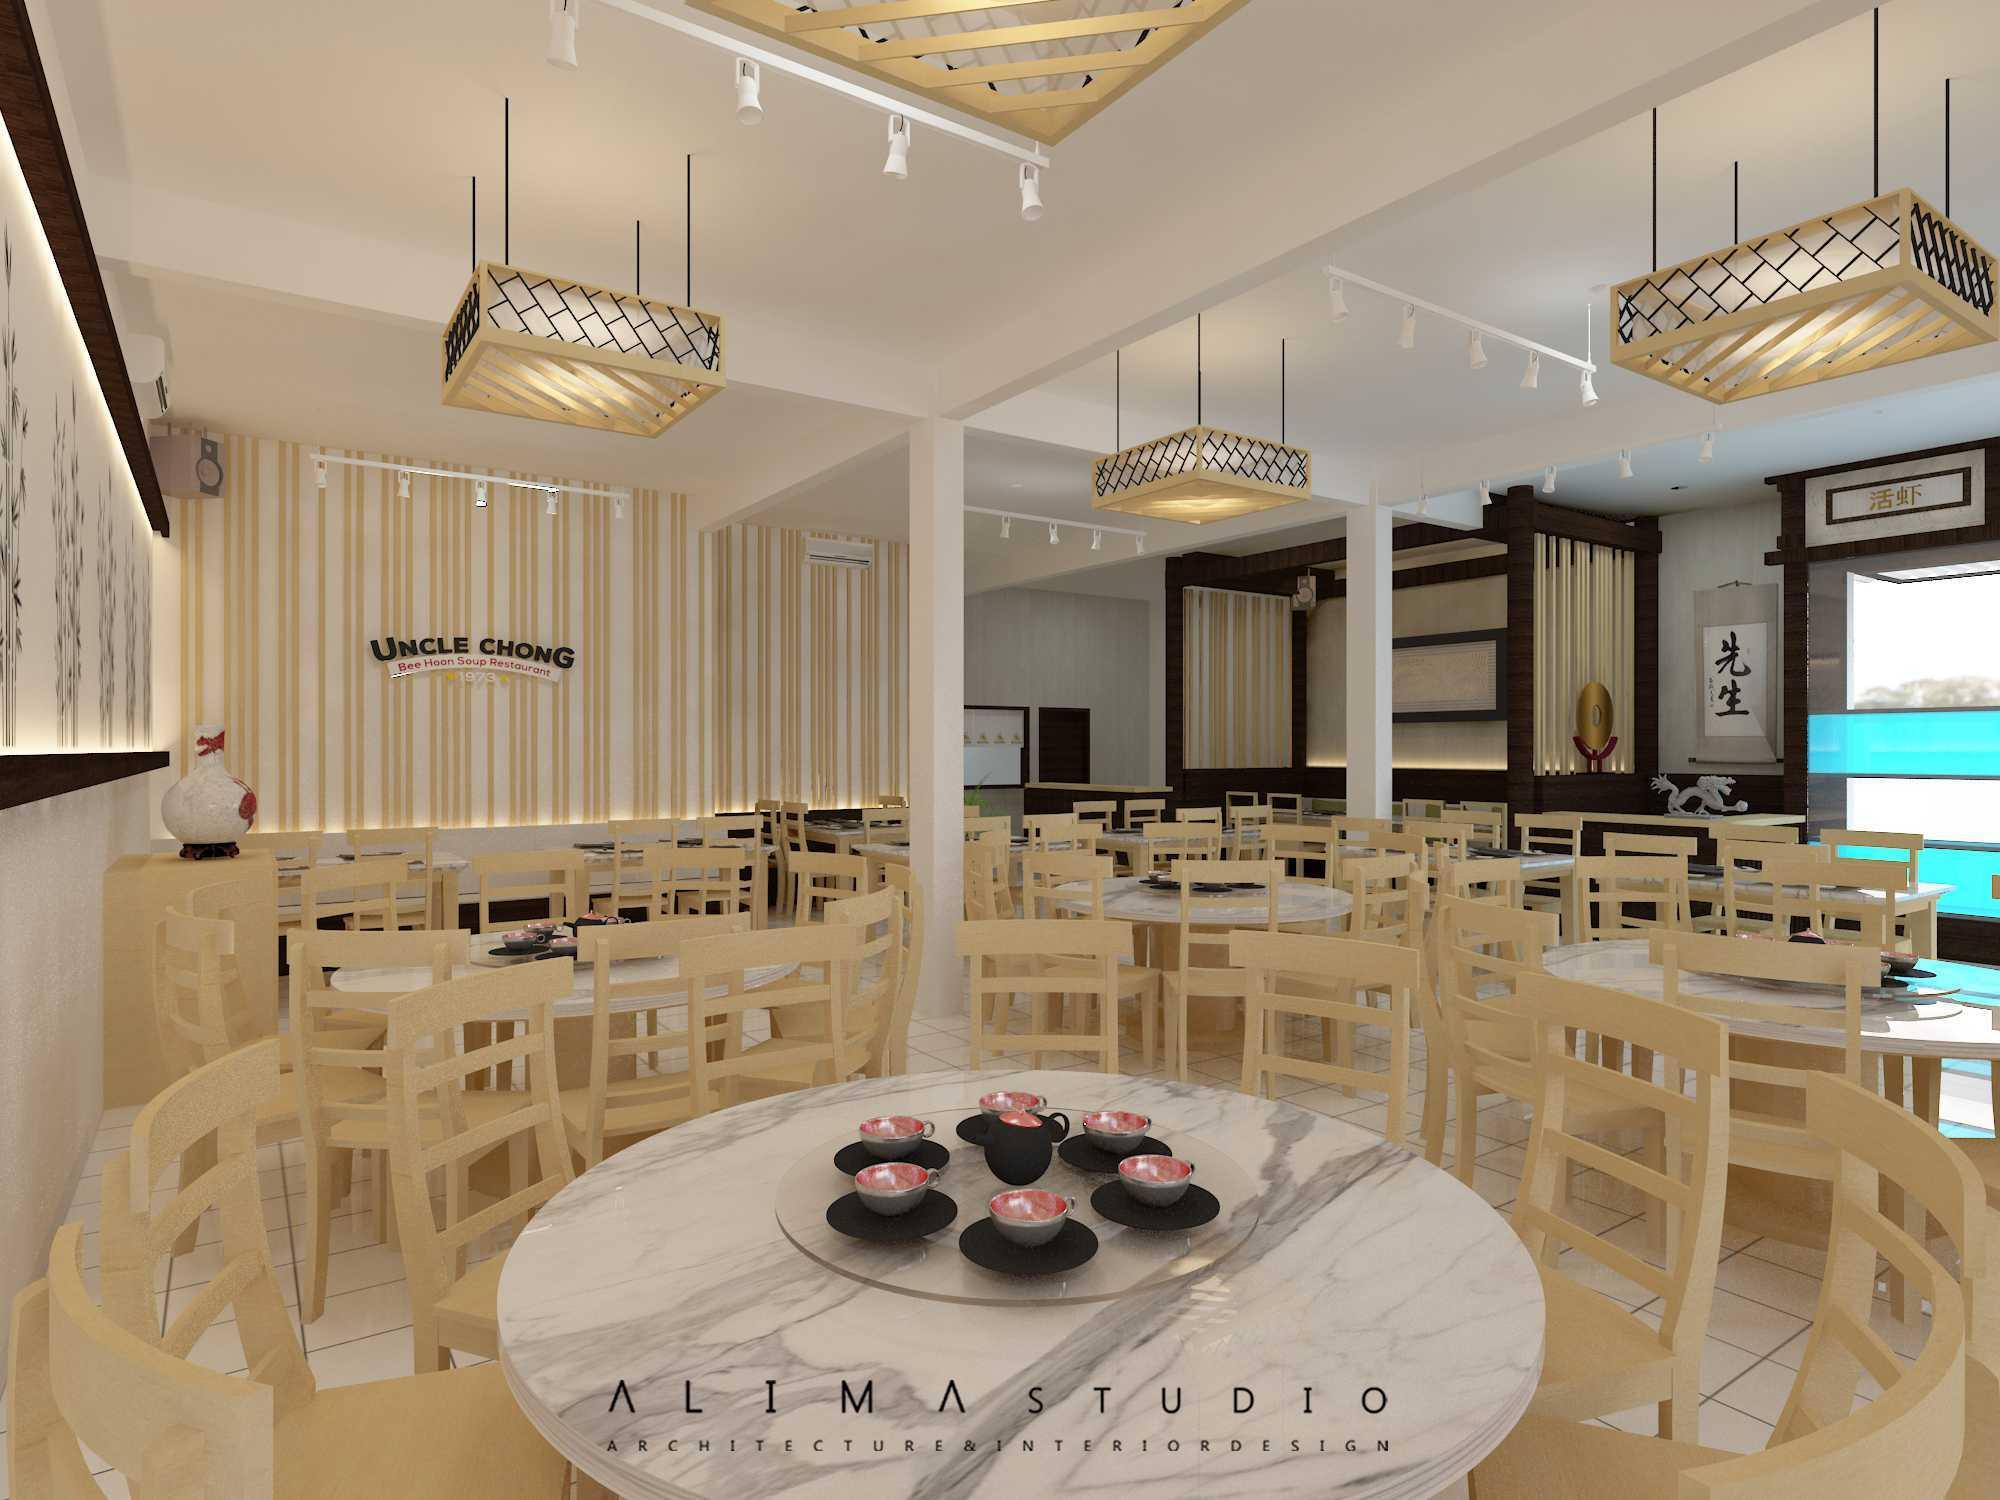 Alima Studio Uncle Chong Restaurant Jl. By Pass Ngurah Rai No.402, Sanur, Denpasar Sel., Bali, 80228, Indonesia Jl. By Pass Ngurah Rai No.402, Sanur, Denpasar Sel., Bali, 80228, Indonesia Alima-Studio-Uncle-Chong-Restaurant  61863